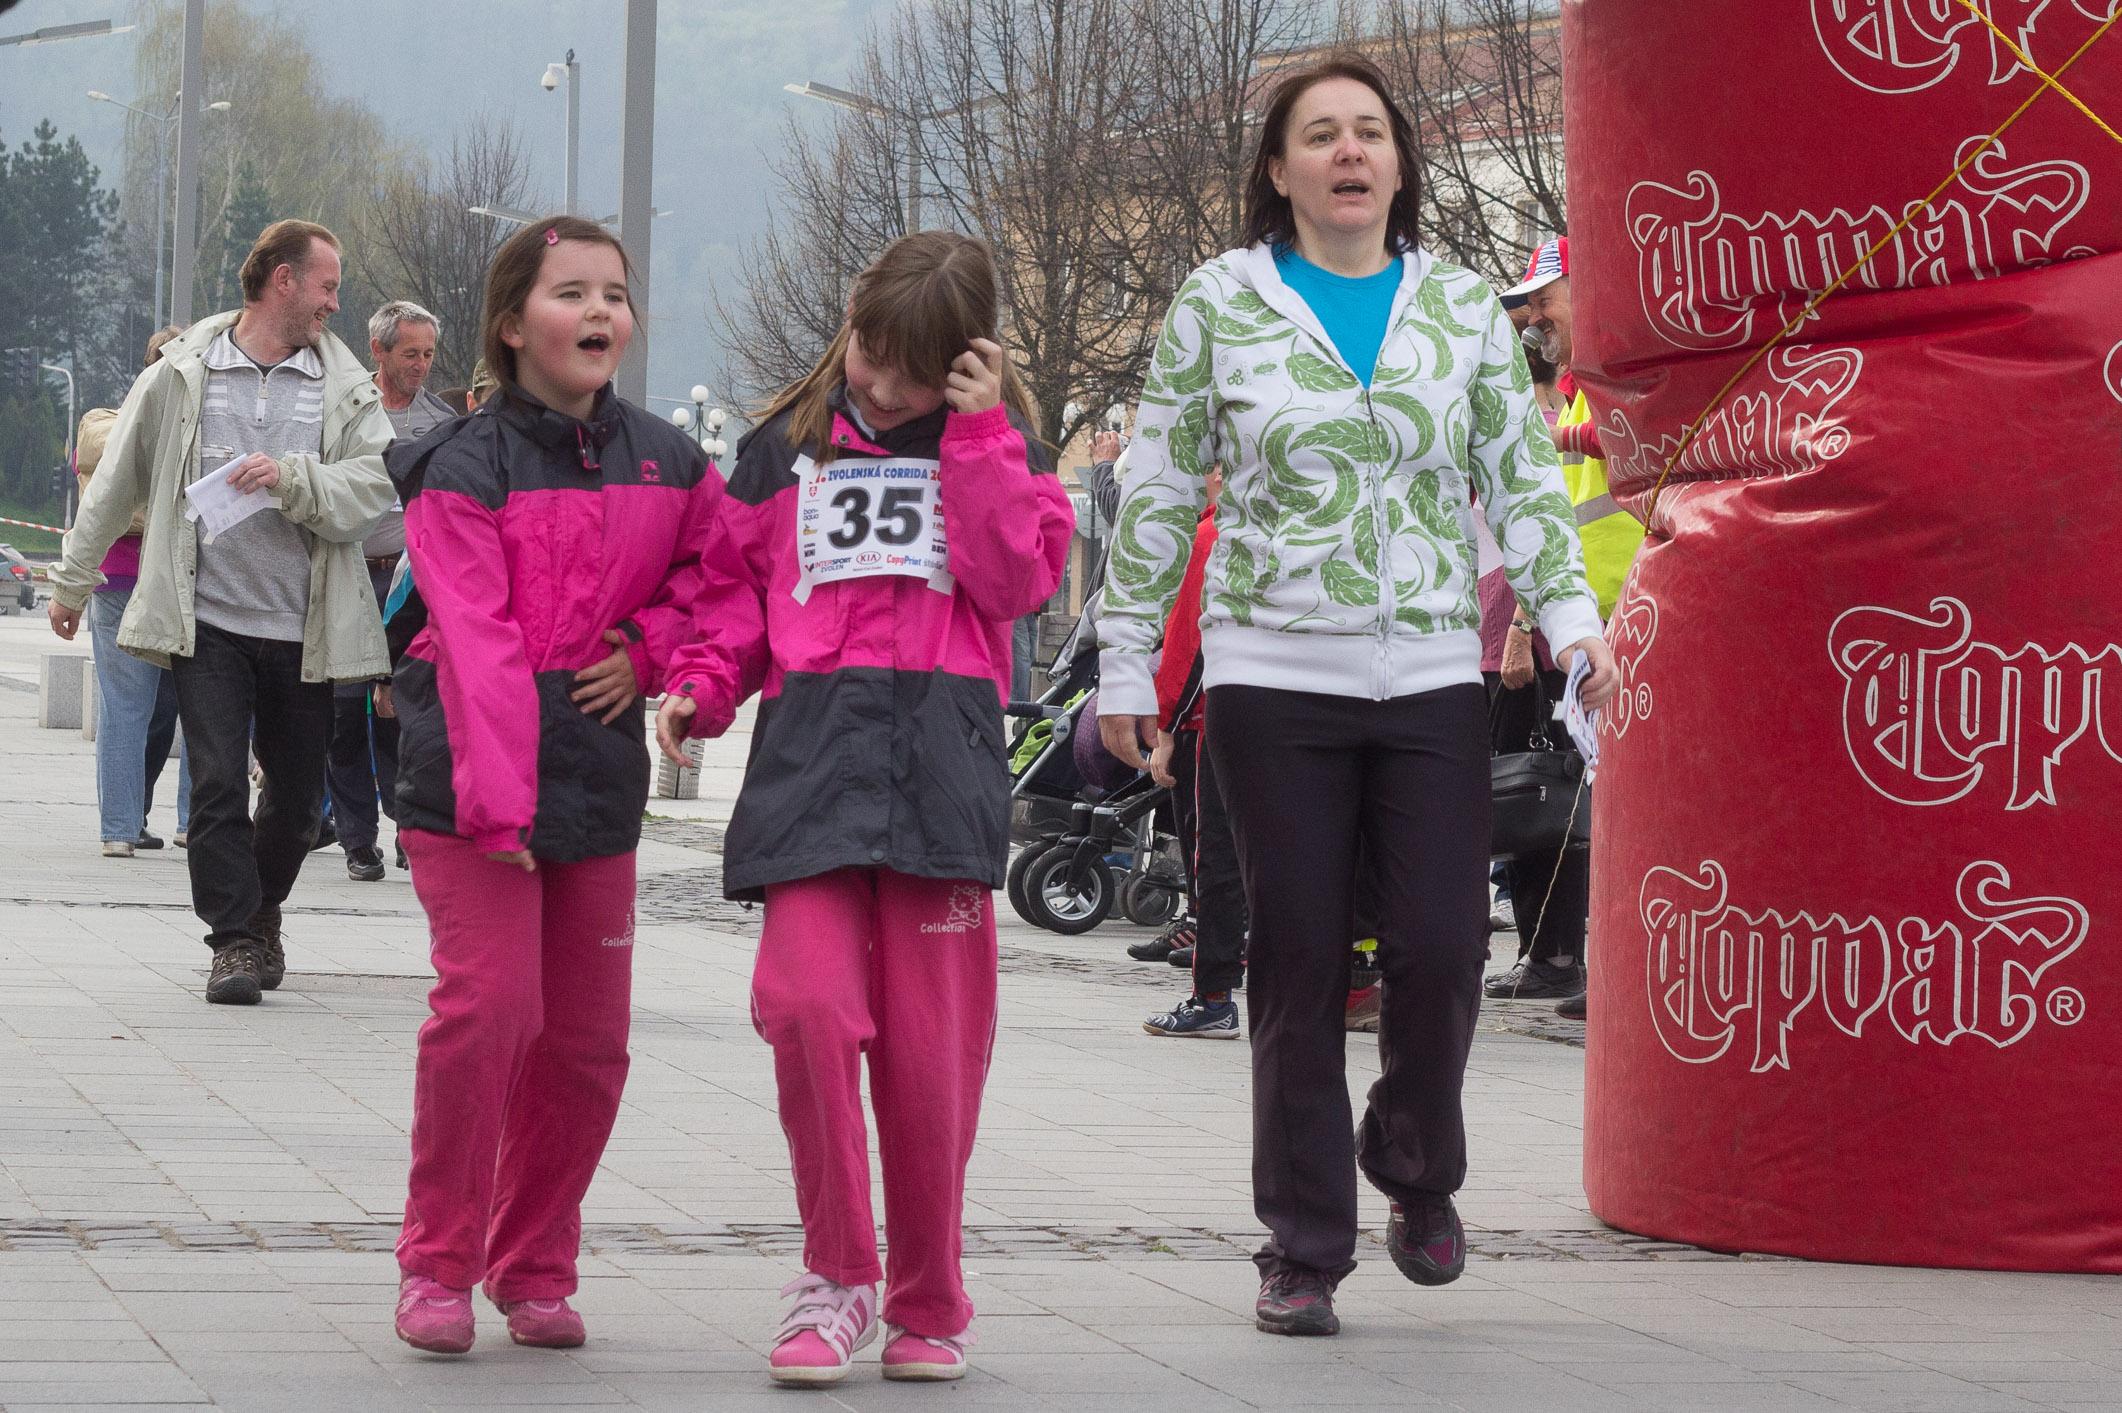 zvolenska-corrida-2014-11-rocnik-13